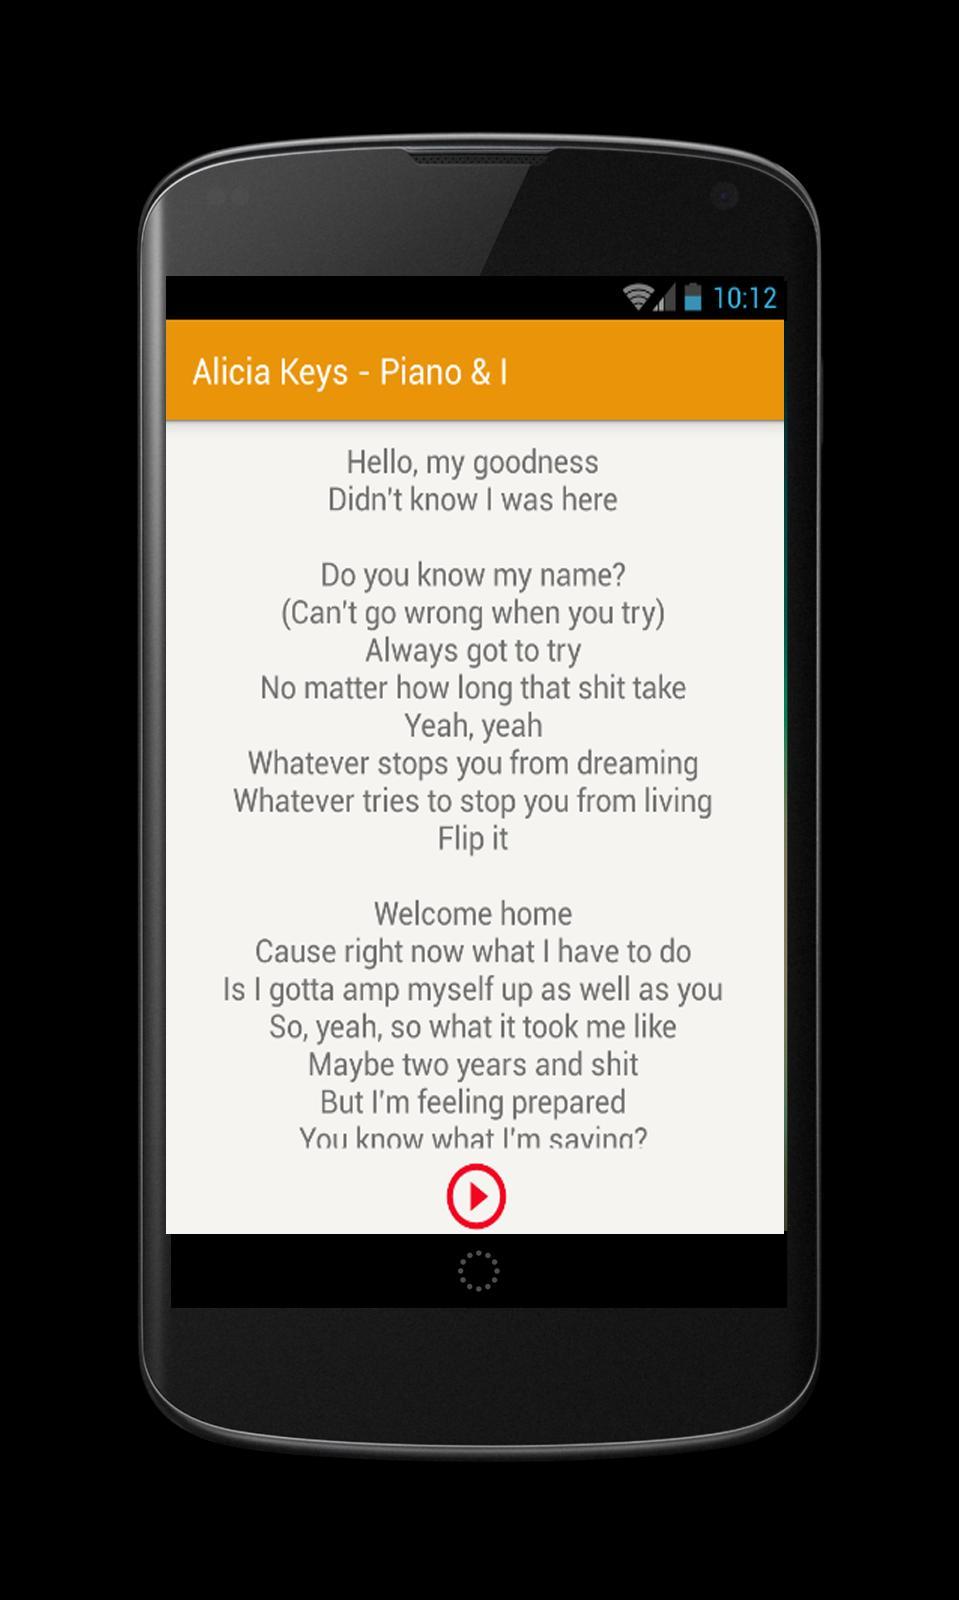 Alicia Keys If I Ain T Got You Audio Download alicia keys if i ain't got you for android - apk download